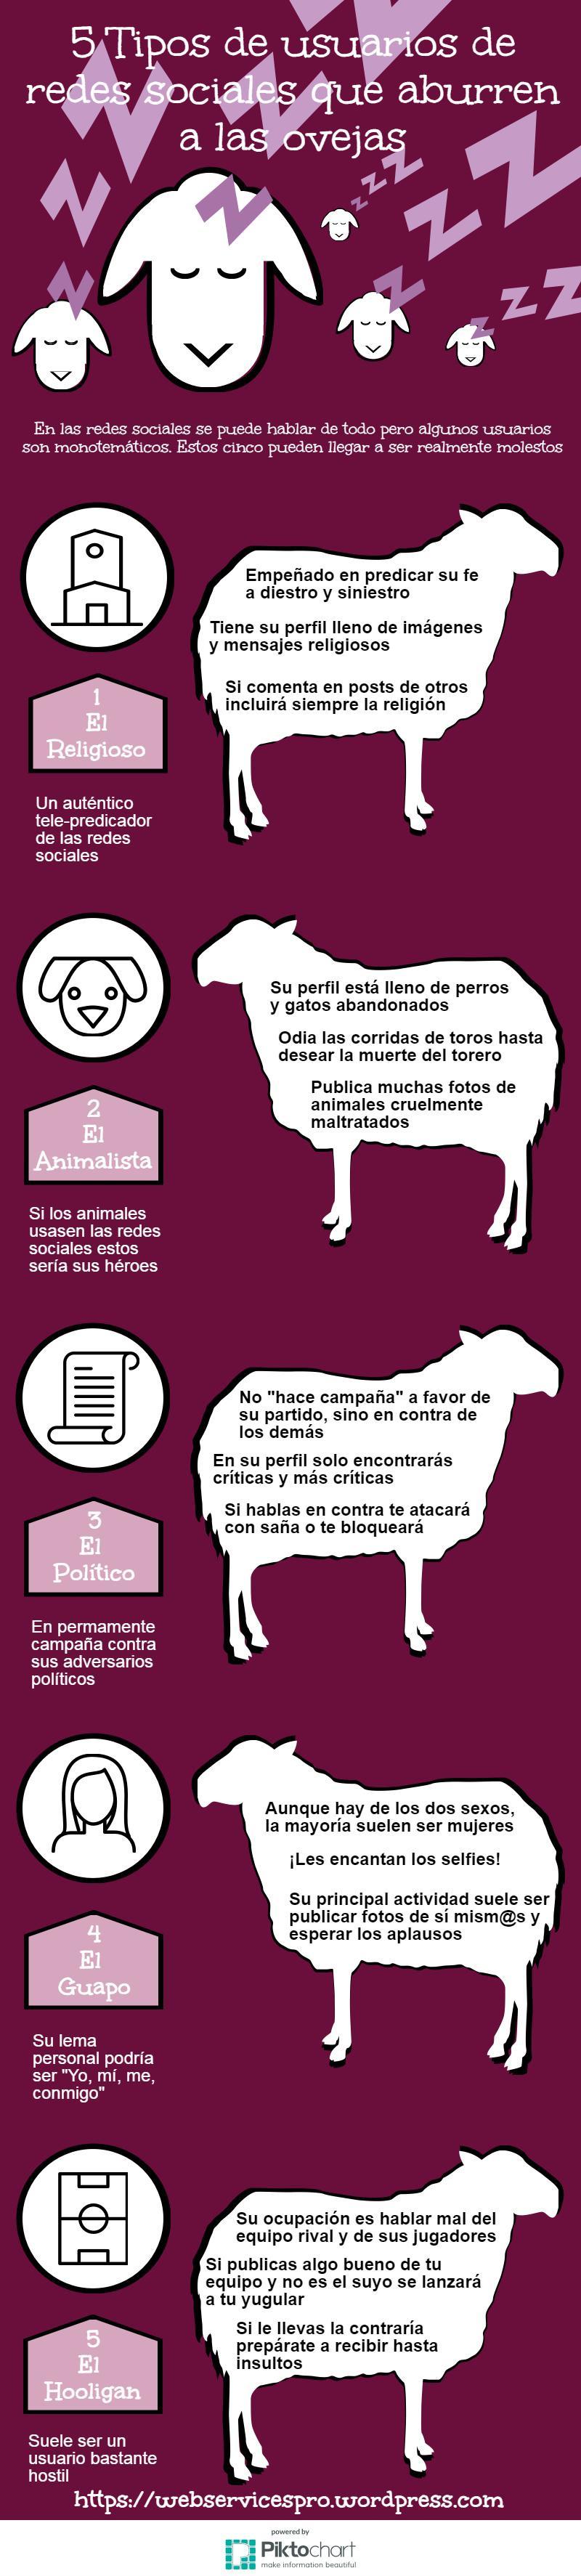 5 tipos de usuarios de Redes Sociales que aburren a las ovejas